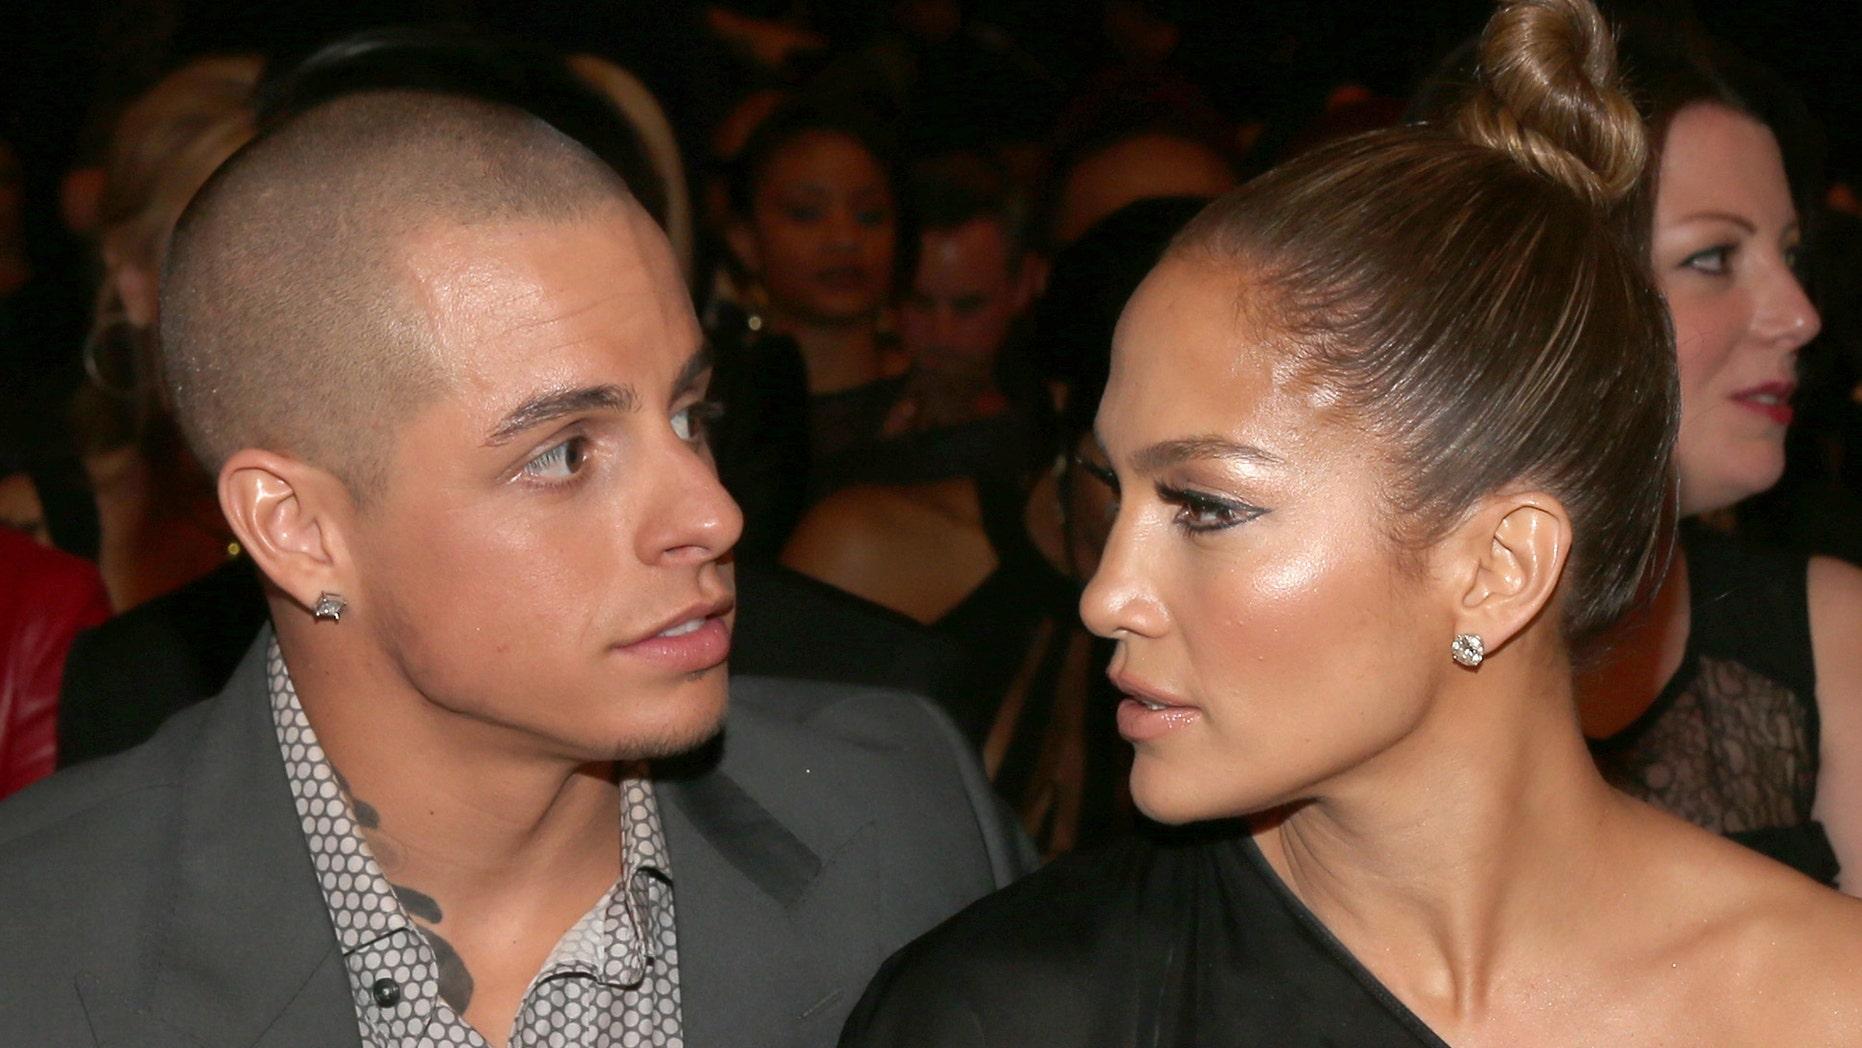 Casper Smart and singer Jennifer Lopez at the 55th Annual GRAMMY Awards on February 10, 2013.